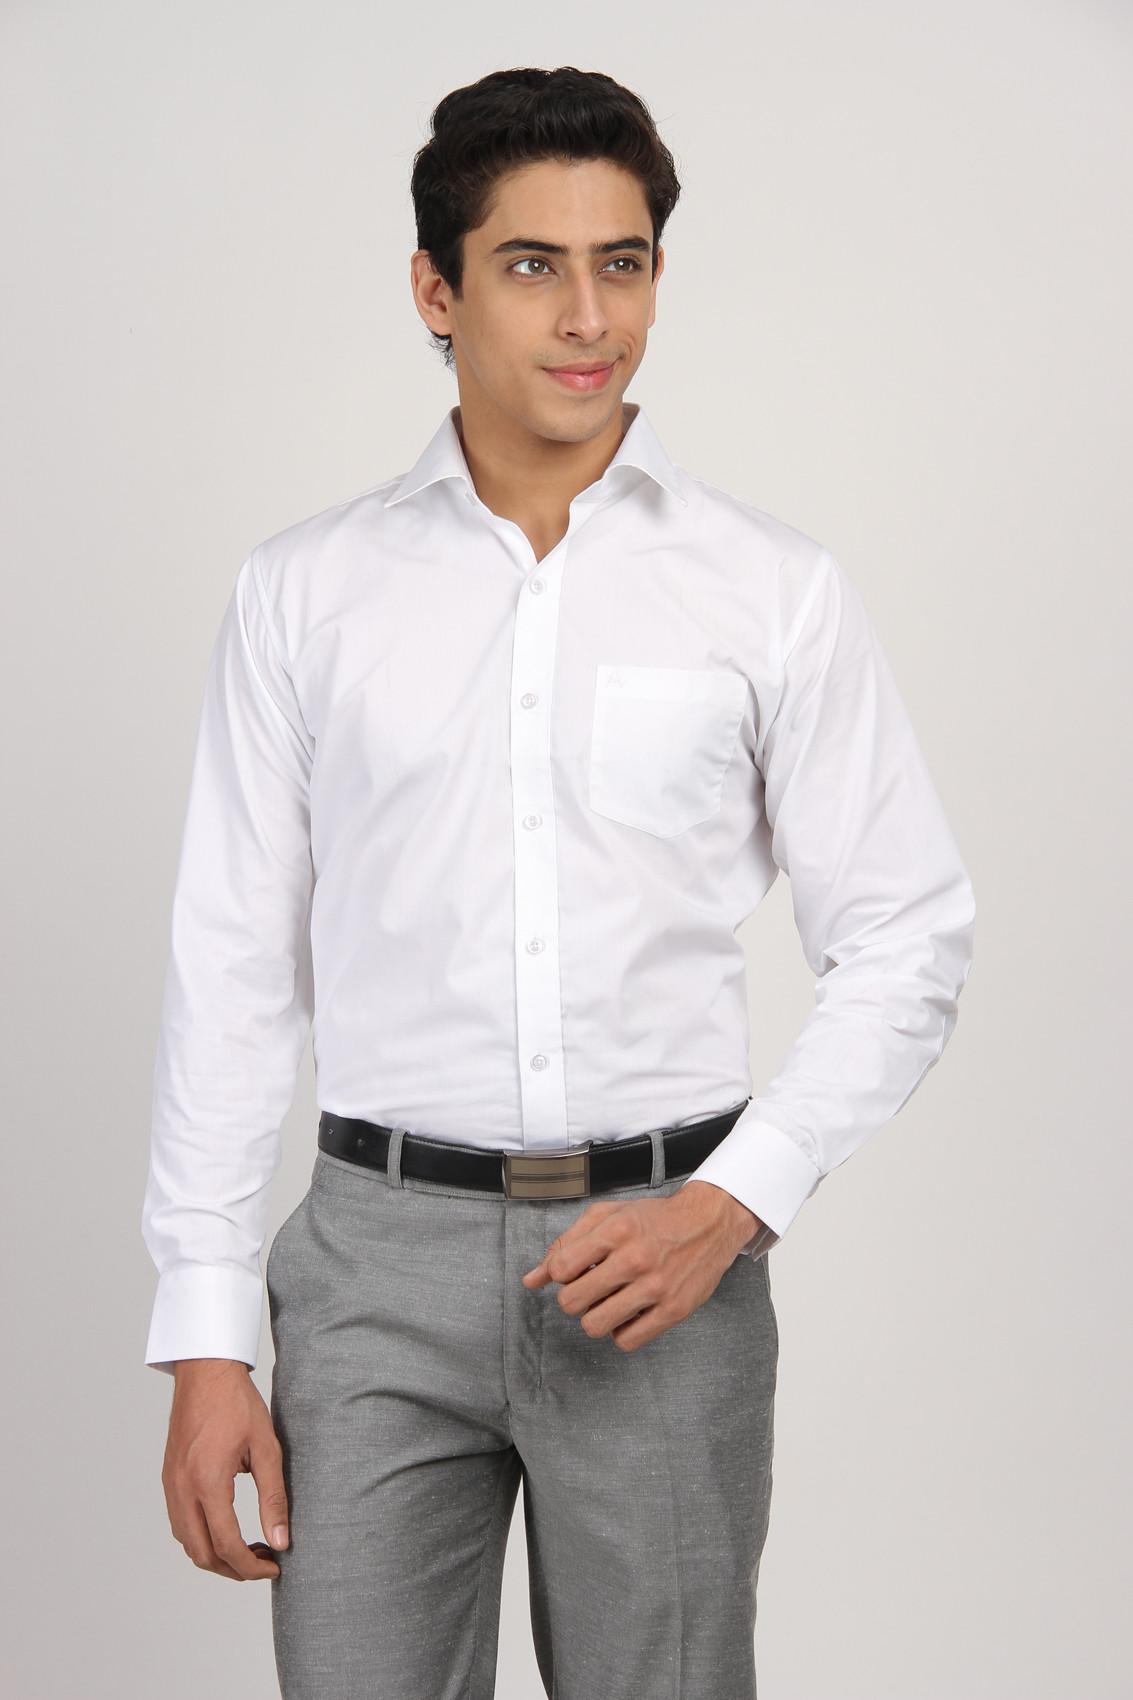 Arihant Men 39 S Solid Formal Shirt Buy White Arihant Men 39 S